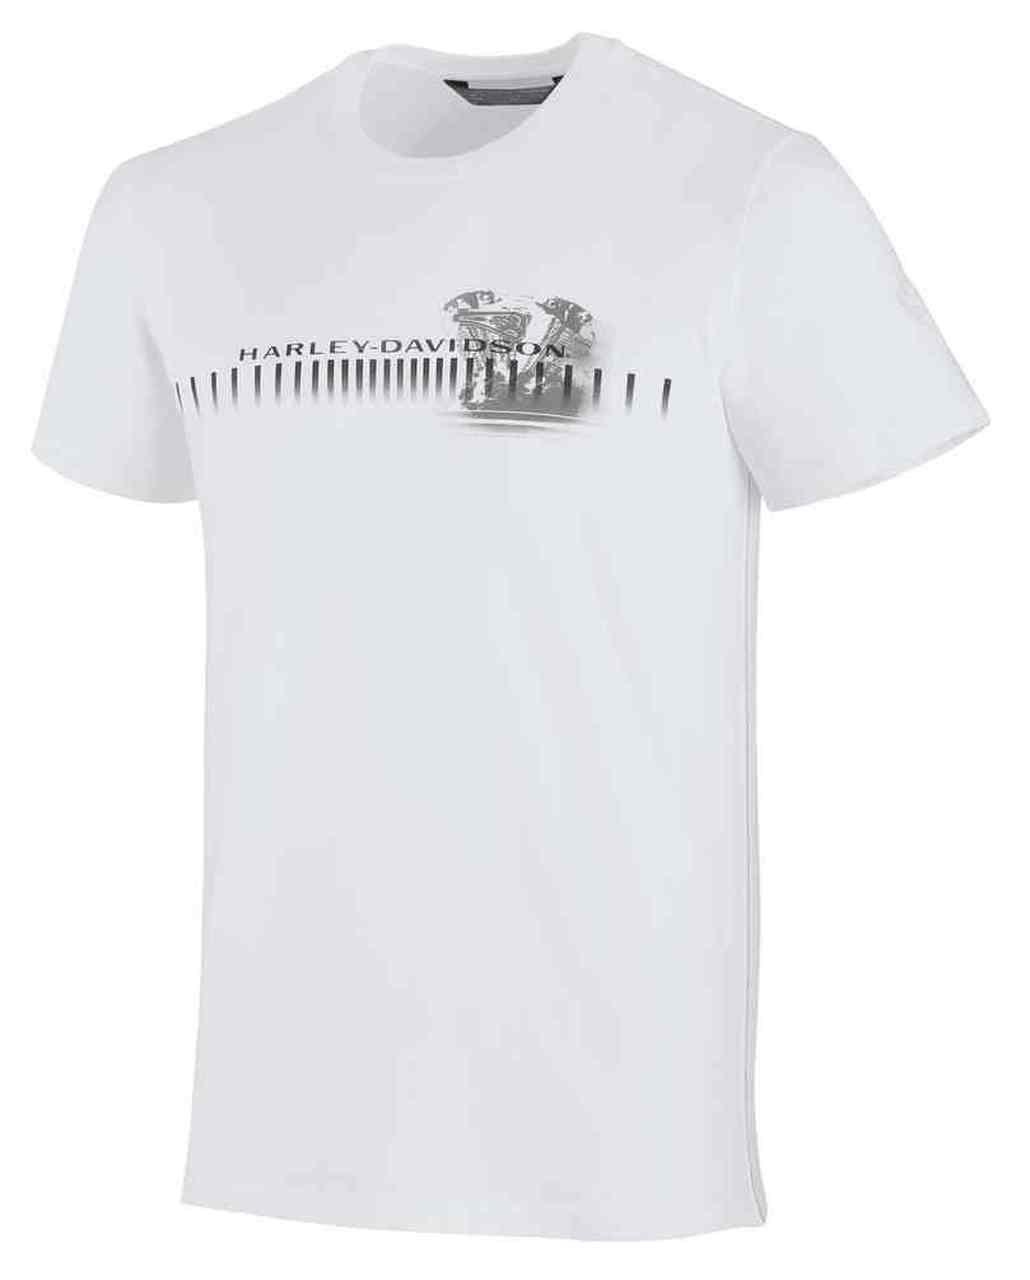 Harley-Davidson® Men's Horizontal Engine Print Slim Fit Tee, White